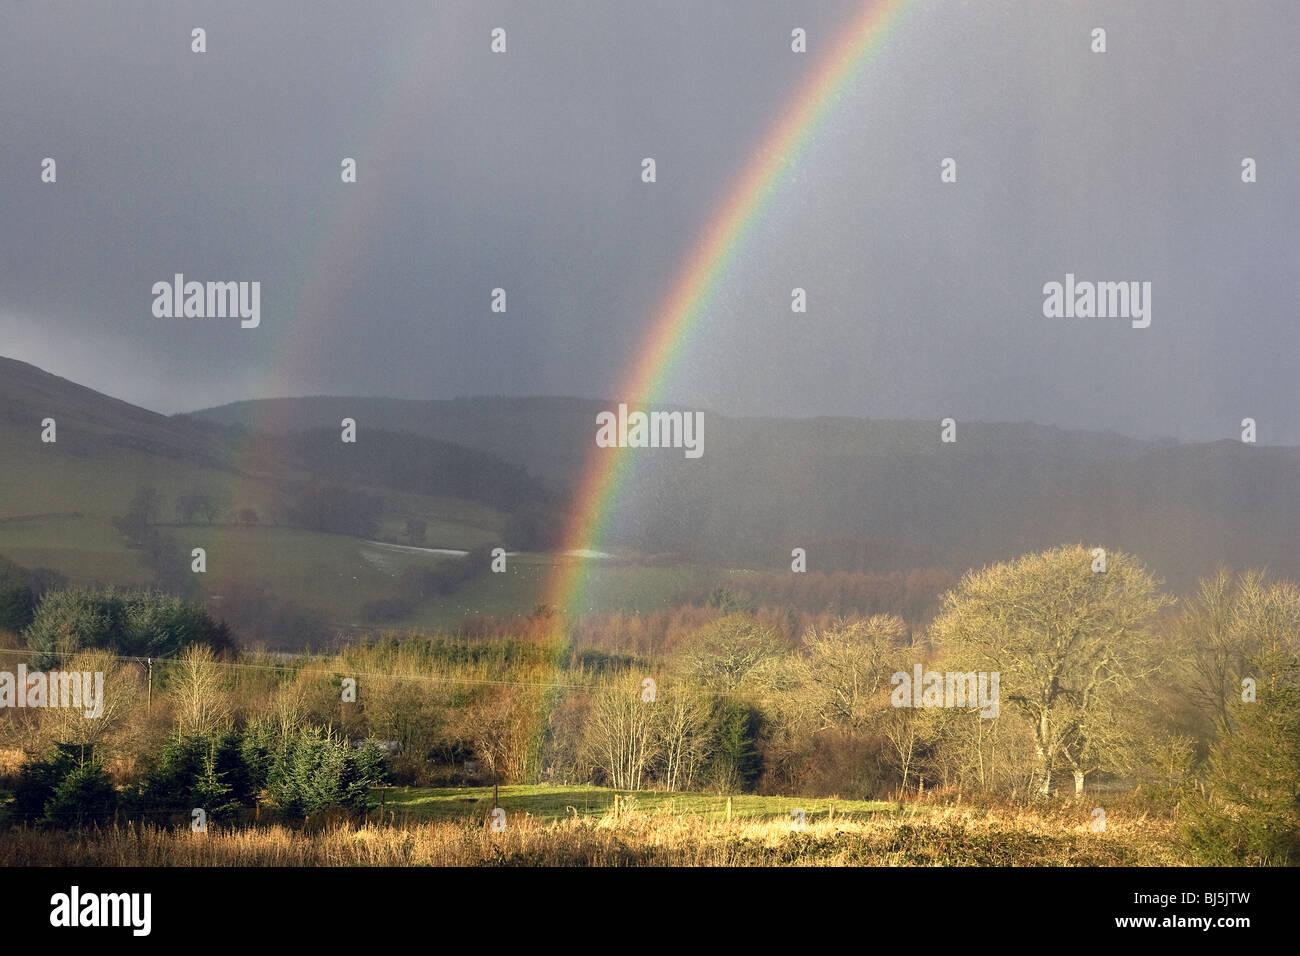 Rainbow in Ysbyty Ystwyth in Wales. - Stock Image